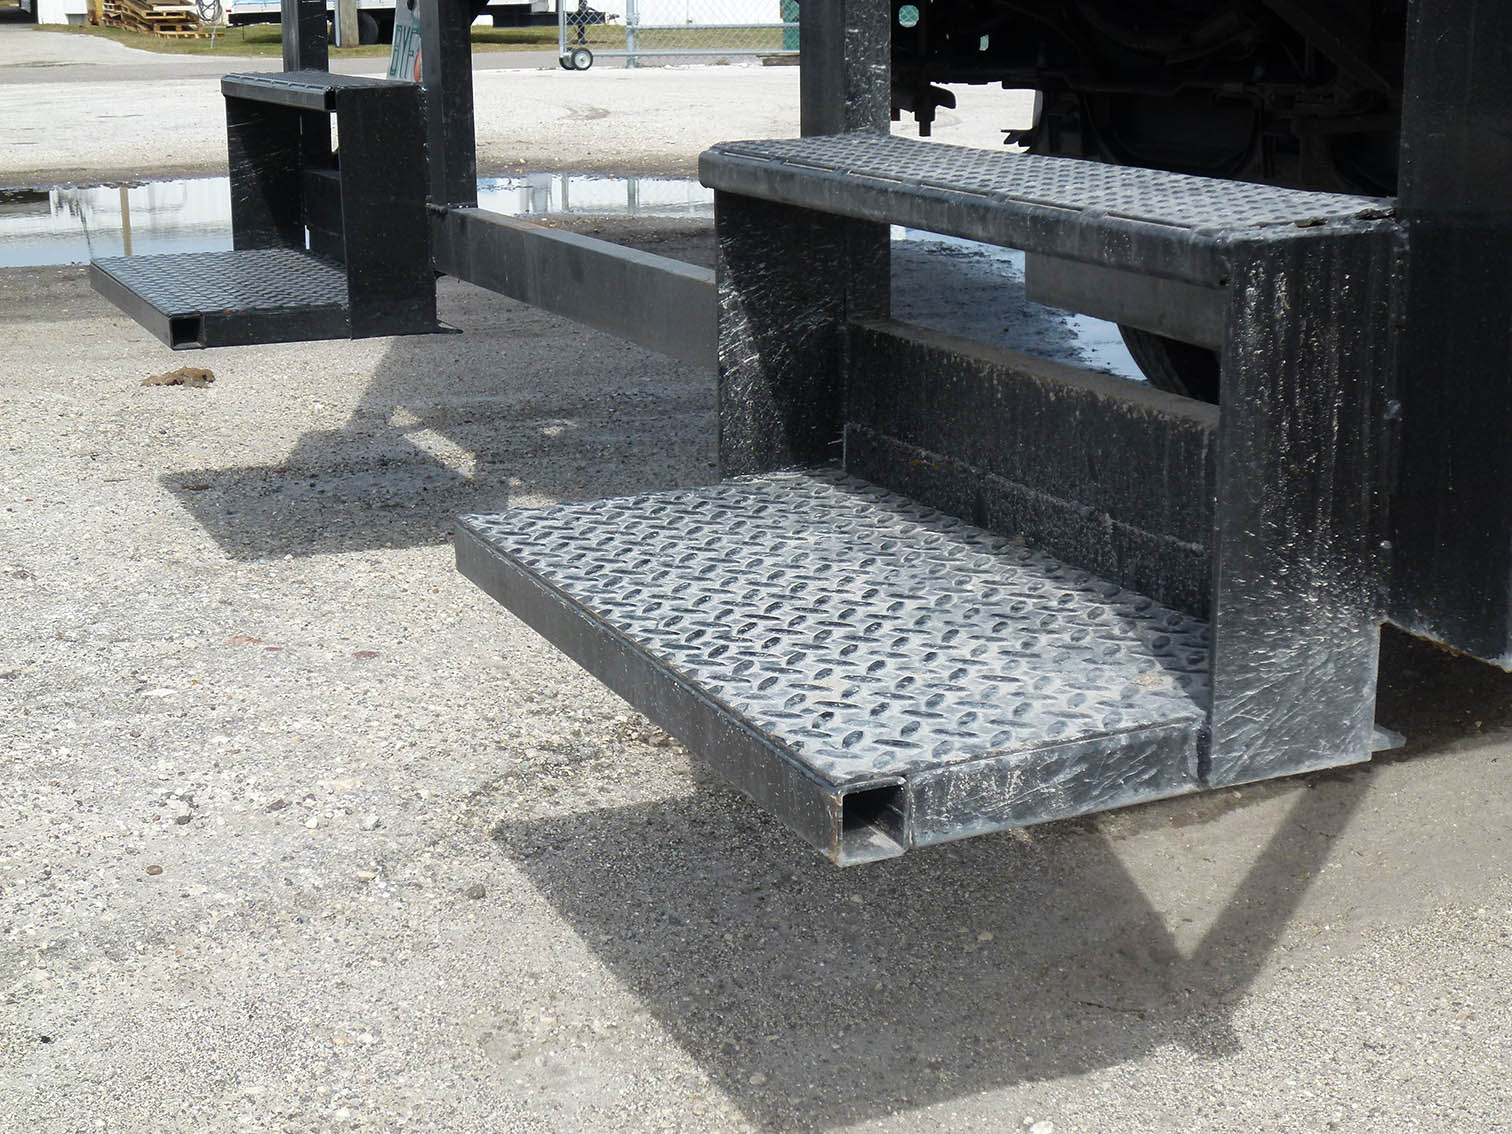 Truck Modify Steps